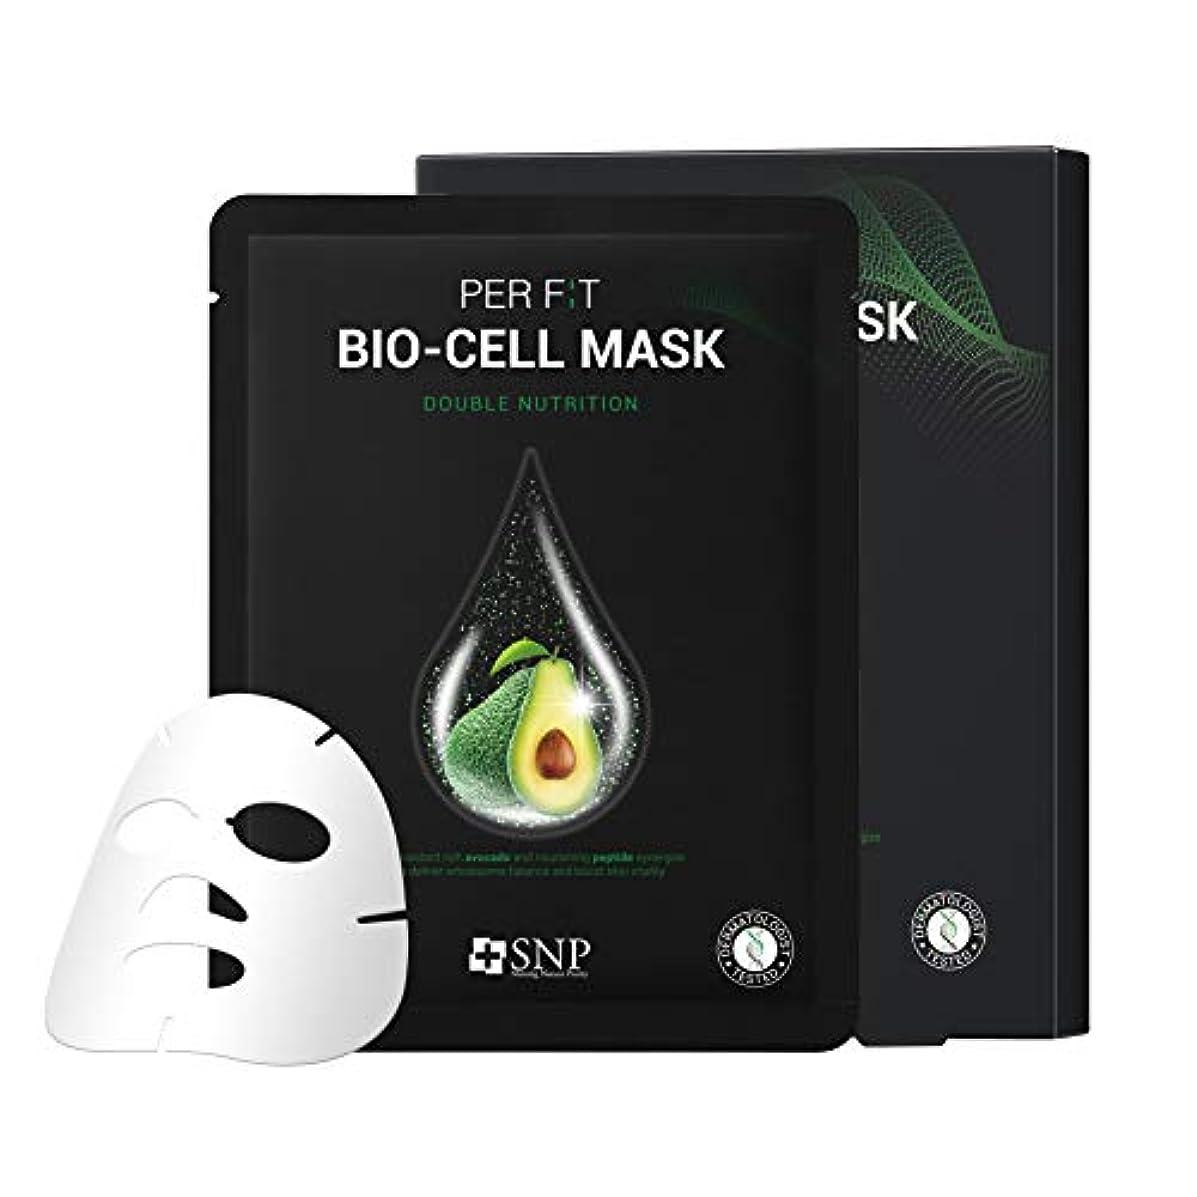 【SNP公式】 パーフィット バイオセルマスク ダブルニュートリション 5枚セット / PER F:T BIO-CELL MASK DOUBLE NUTRITION 韓国パック 韓国コスメ パック マスクパック シートマスク